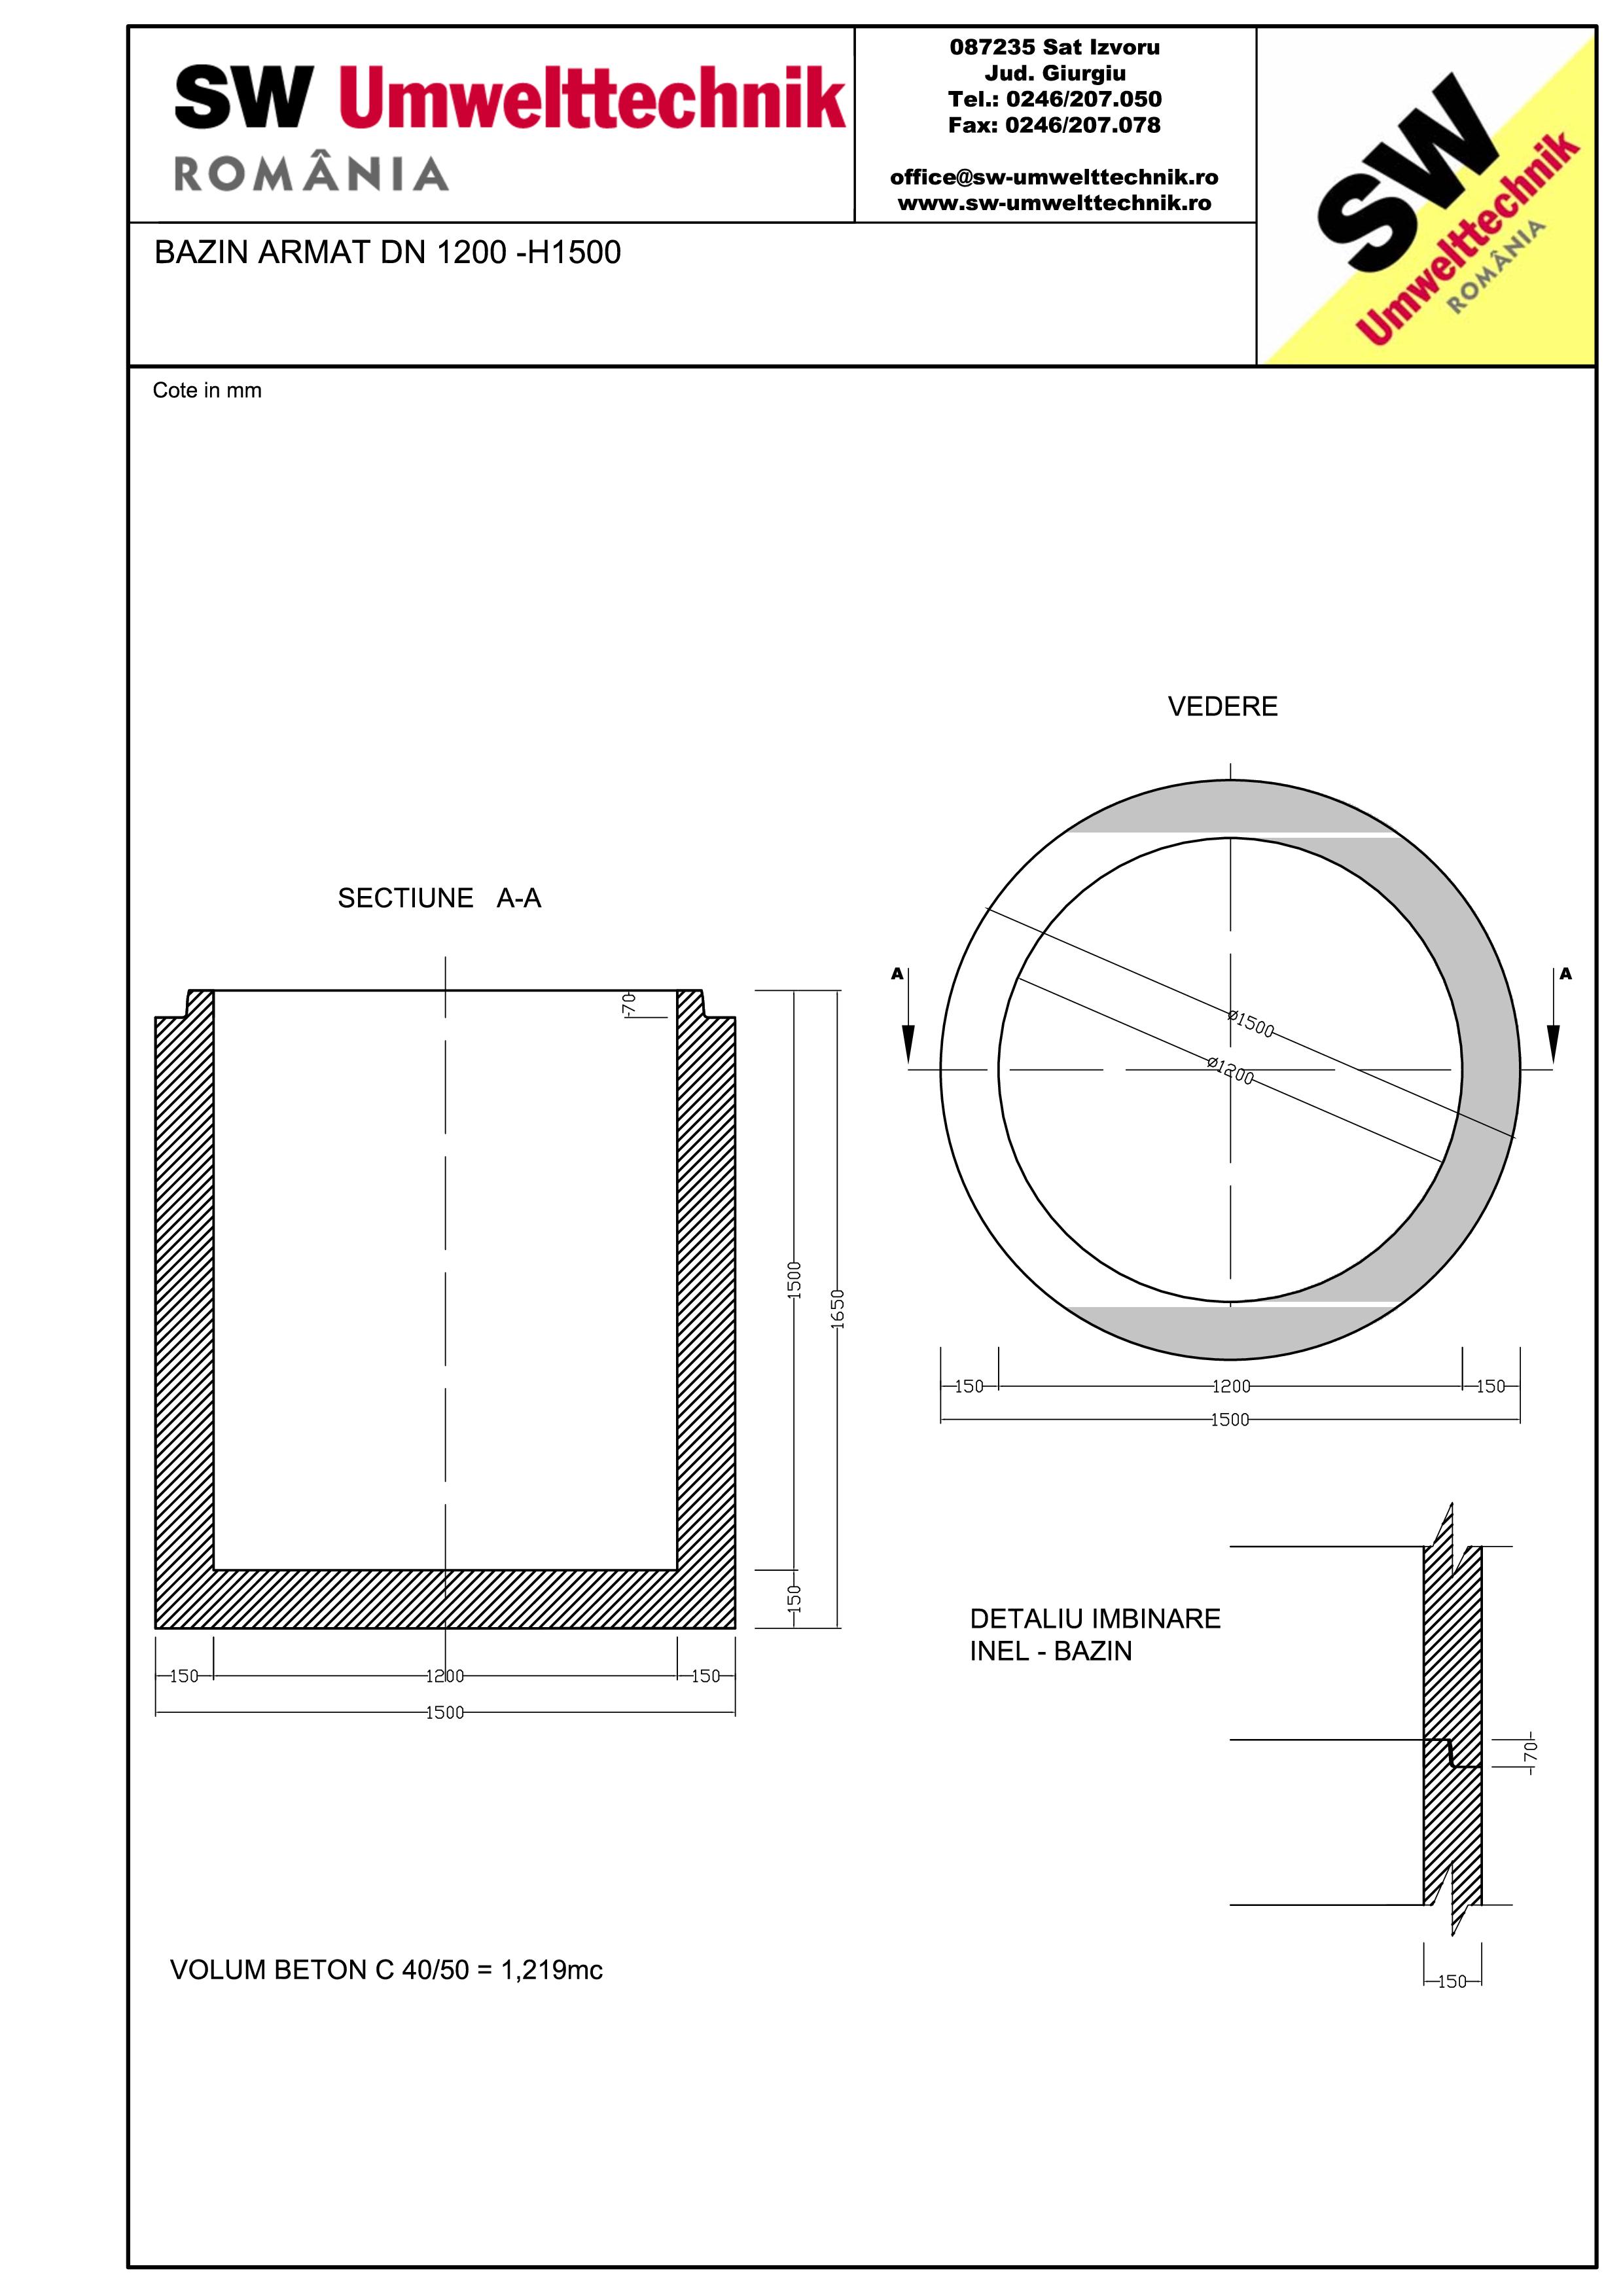 Pagina 1 - CAD-PDF Bazin armat DN1200 H1500 SW UMWELTTECHNIK Detaliu de produs